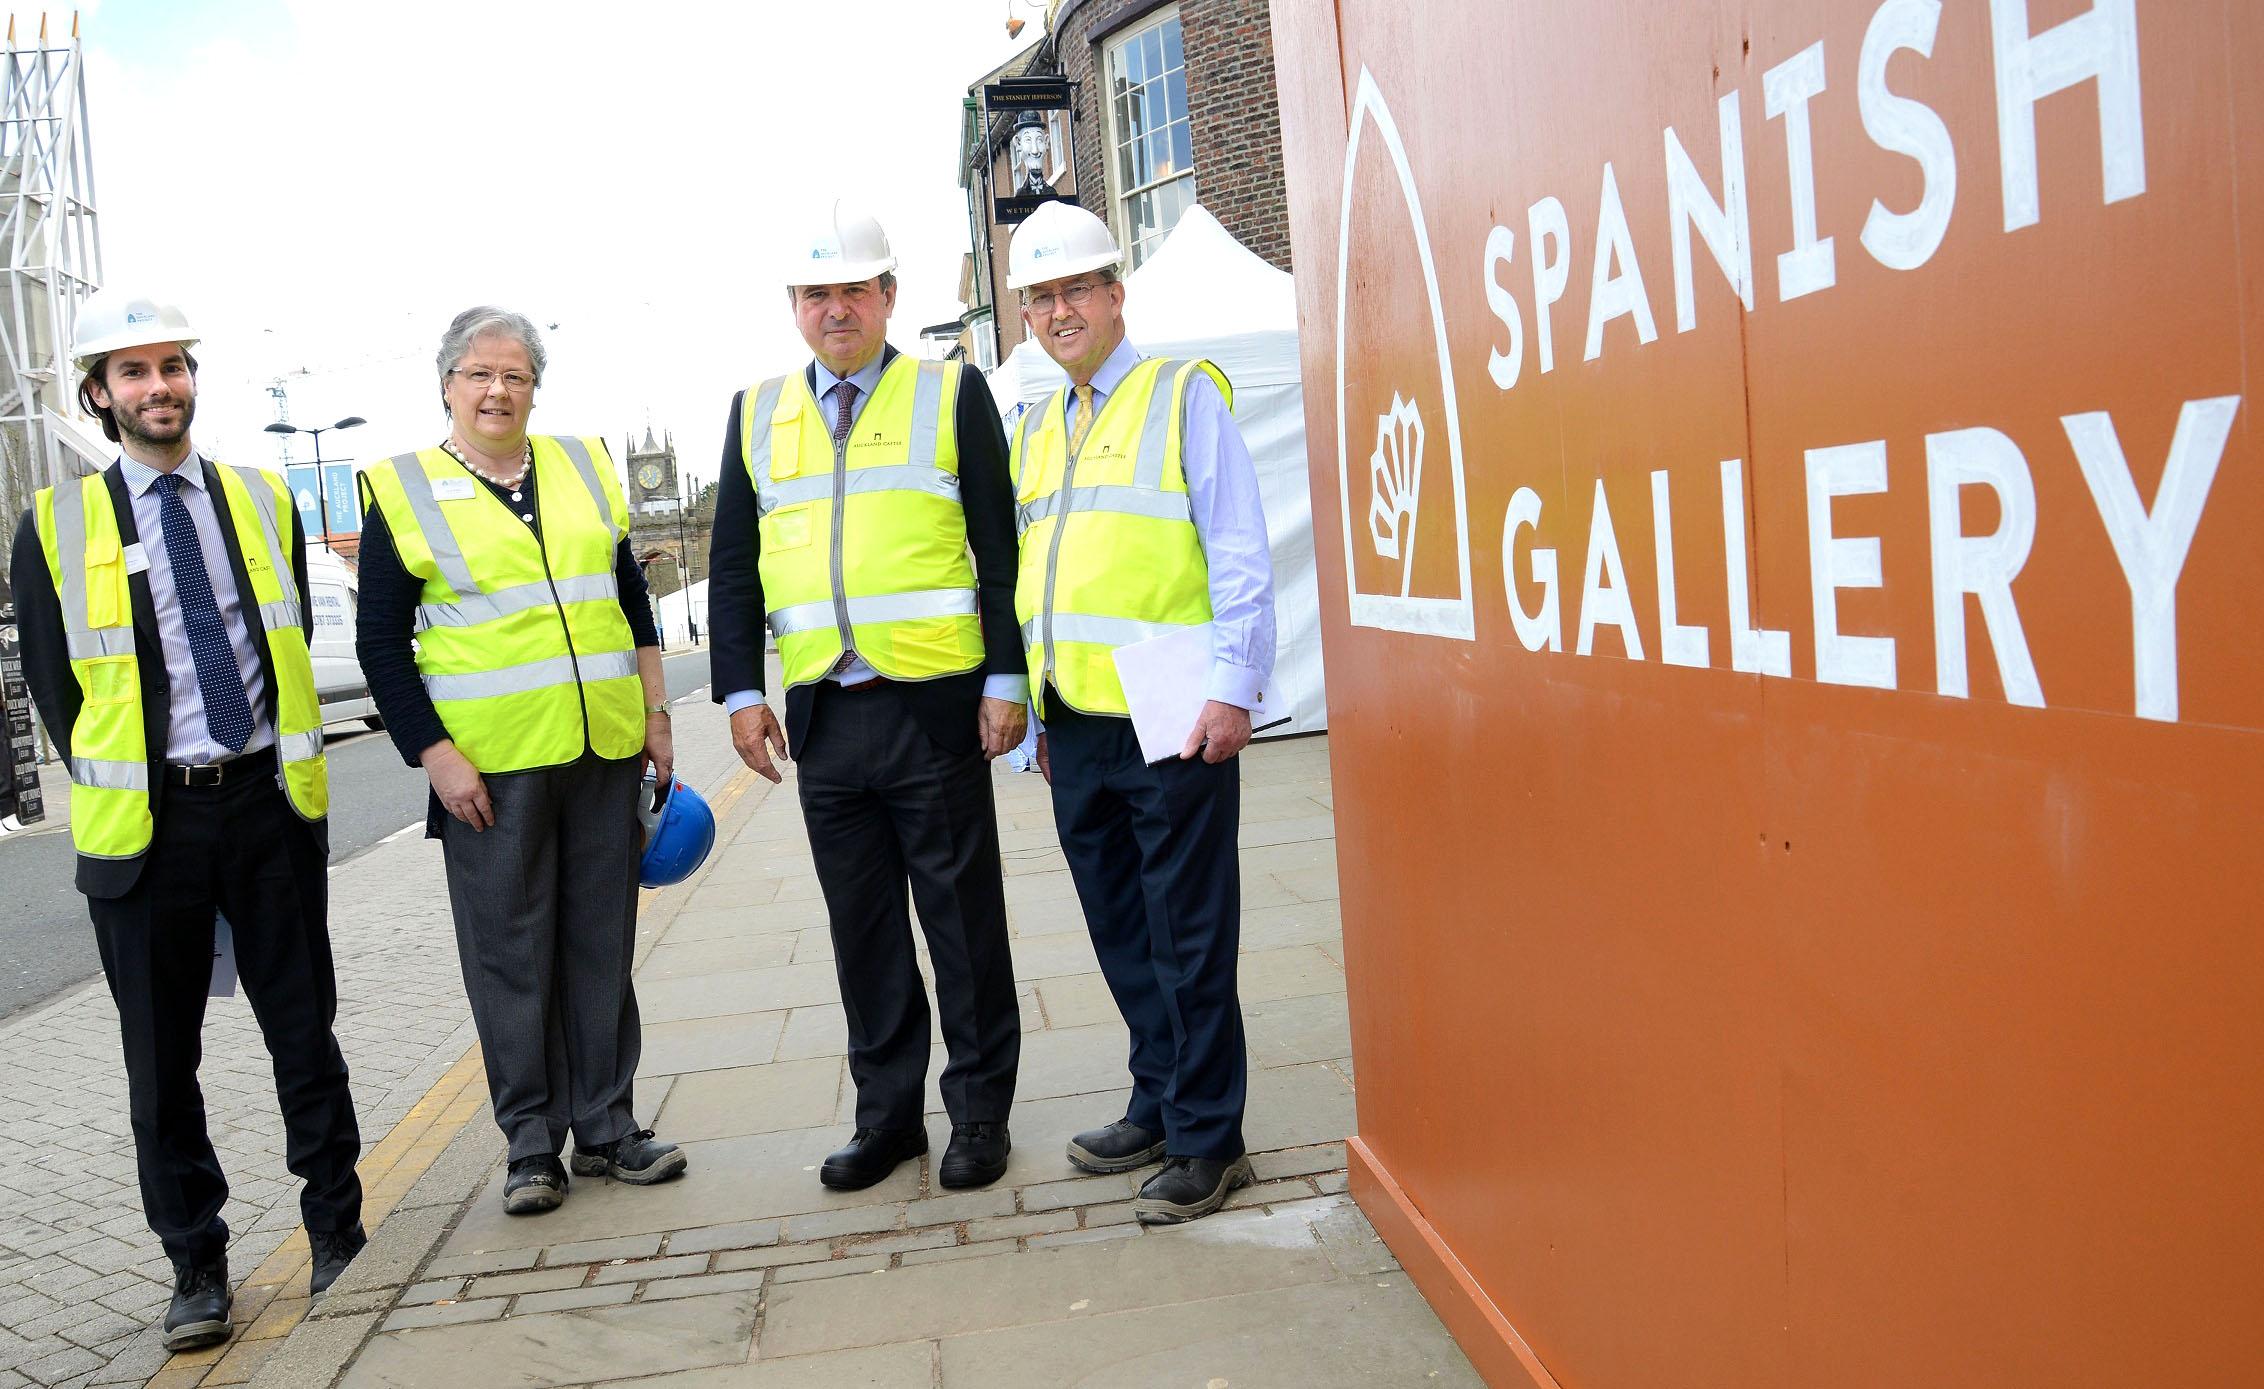 Spanish Ambassador Visits Art Gallery